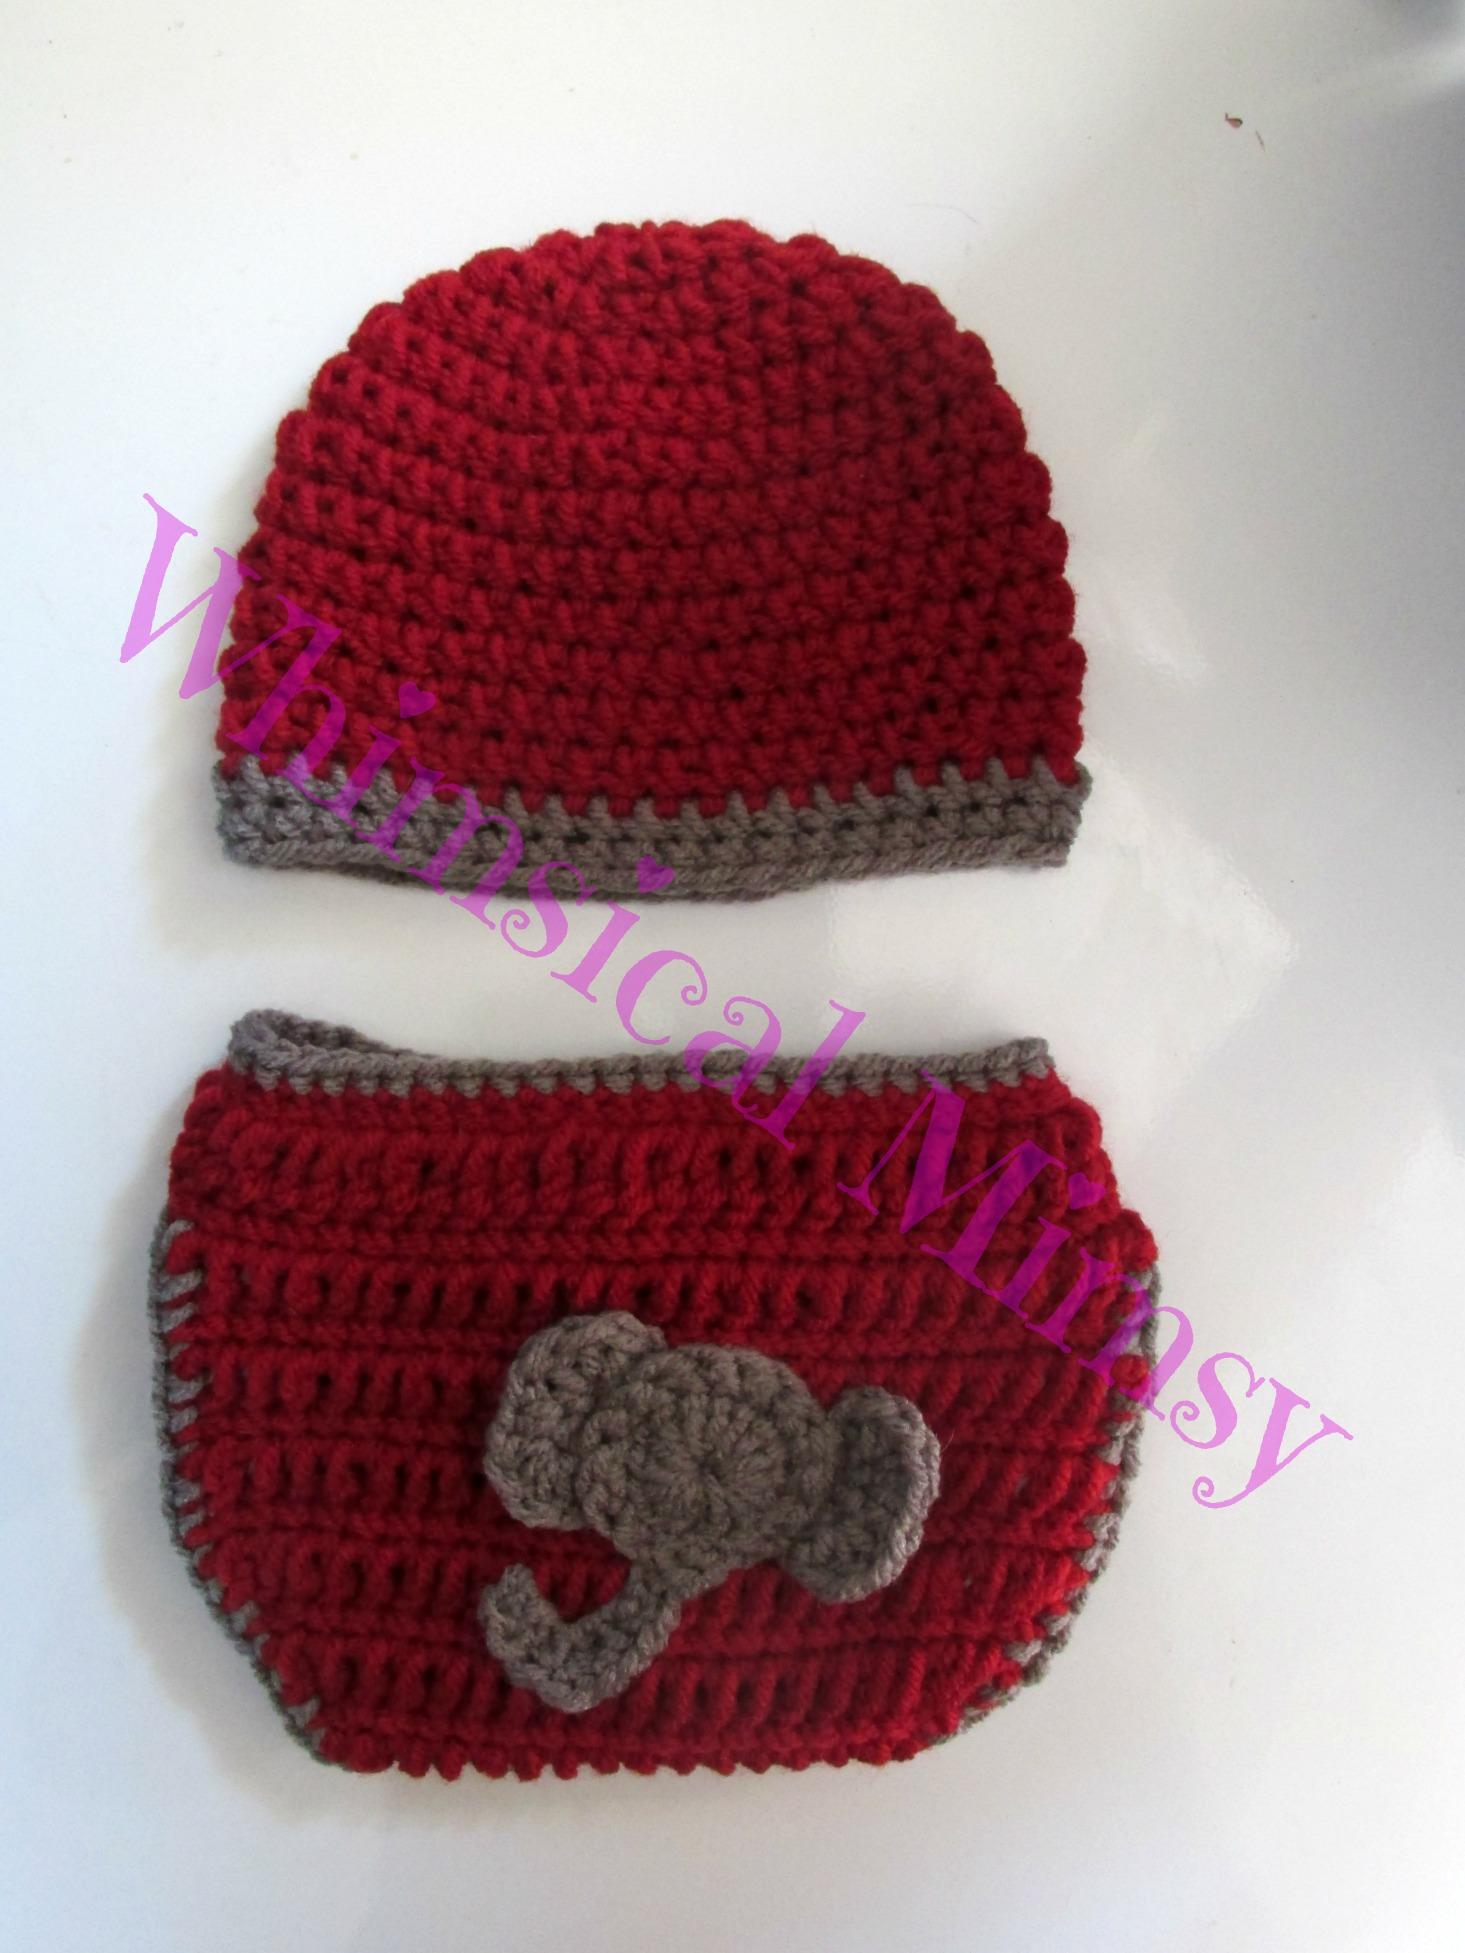 d3fd43aaba8 Crochet Alabama Football Inspired Newborn Hat and Diaper Cover Set Photo  Prop - Thumbnail 1 ...